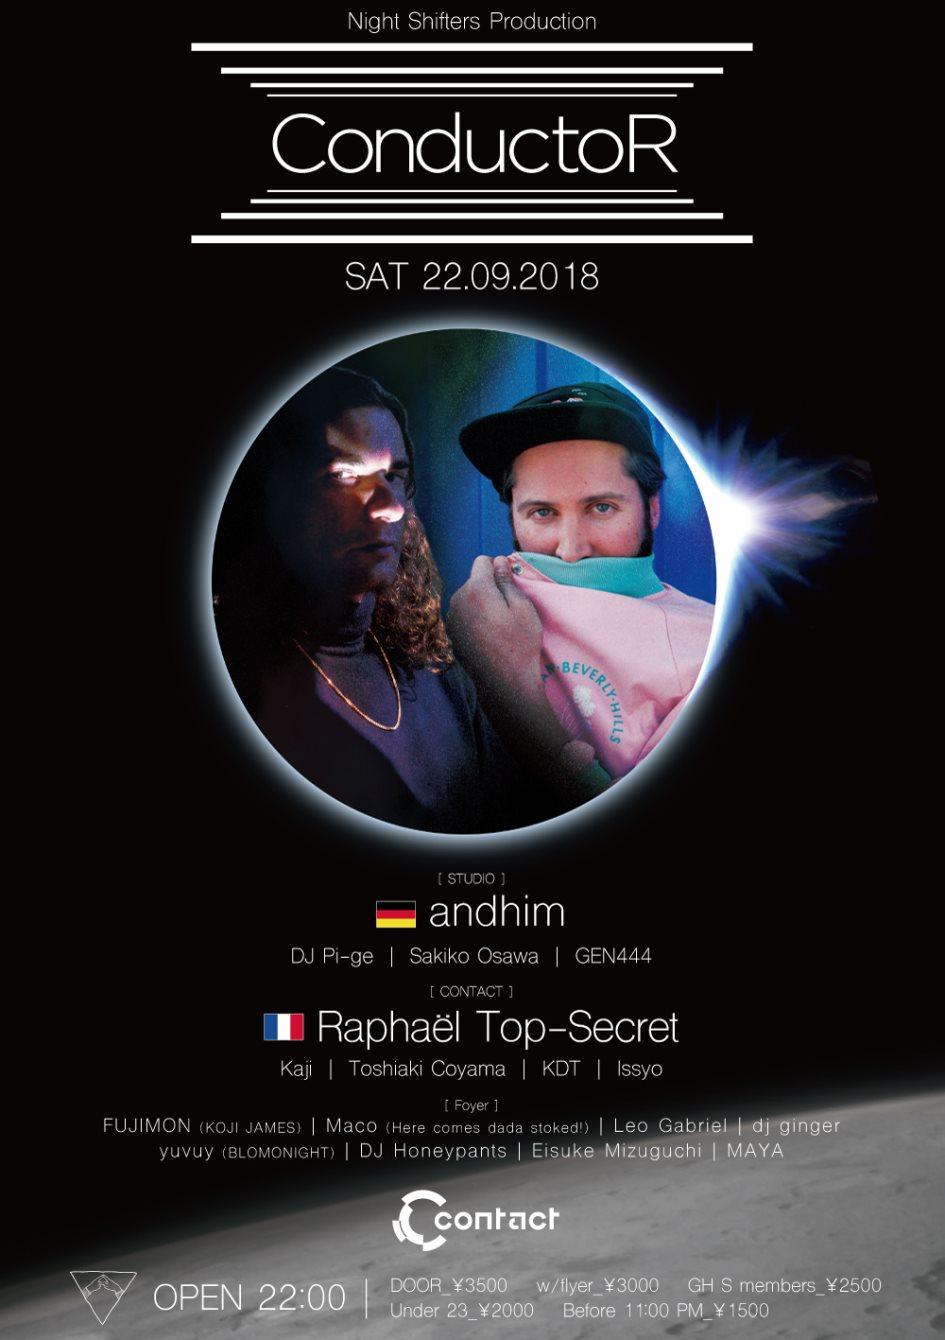 Conductor Feat. Andhim, Raphaël Top-Secret - Flyer front